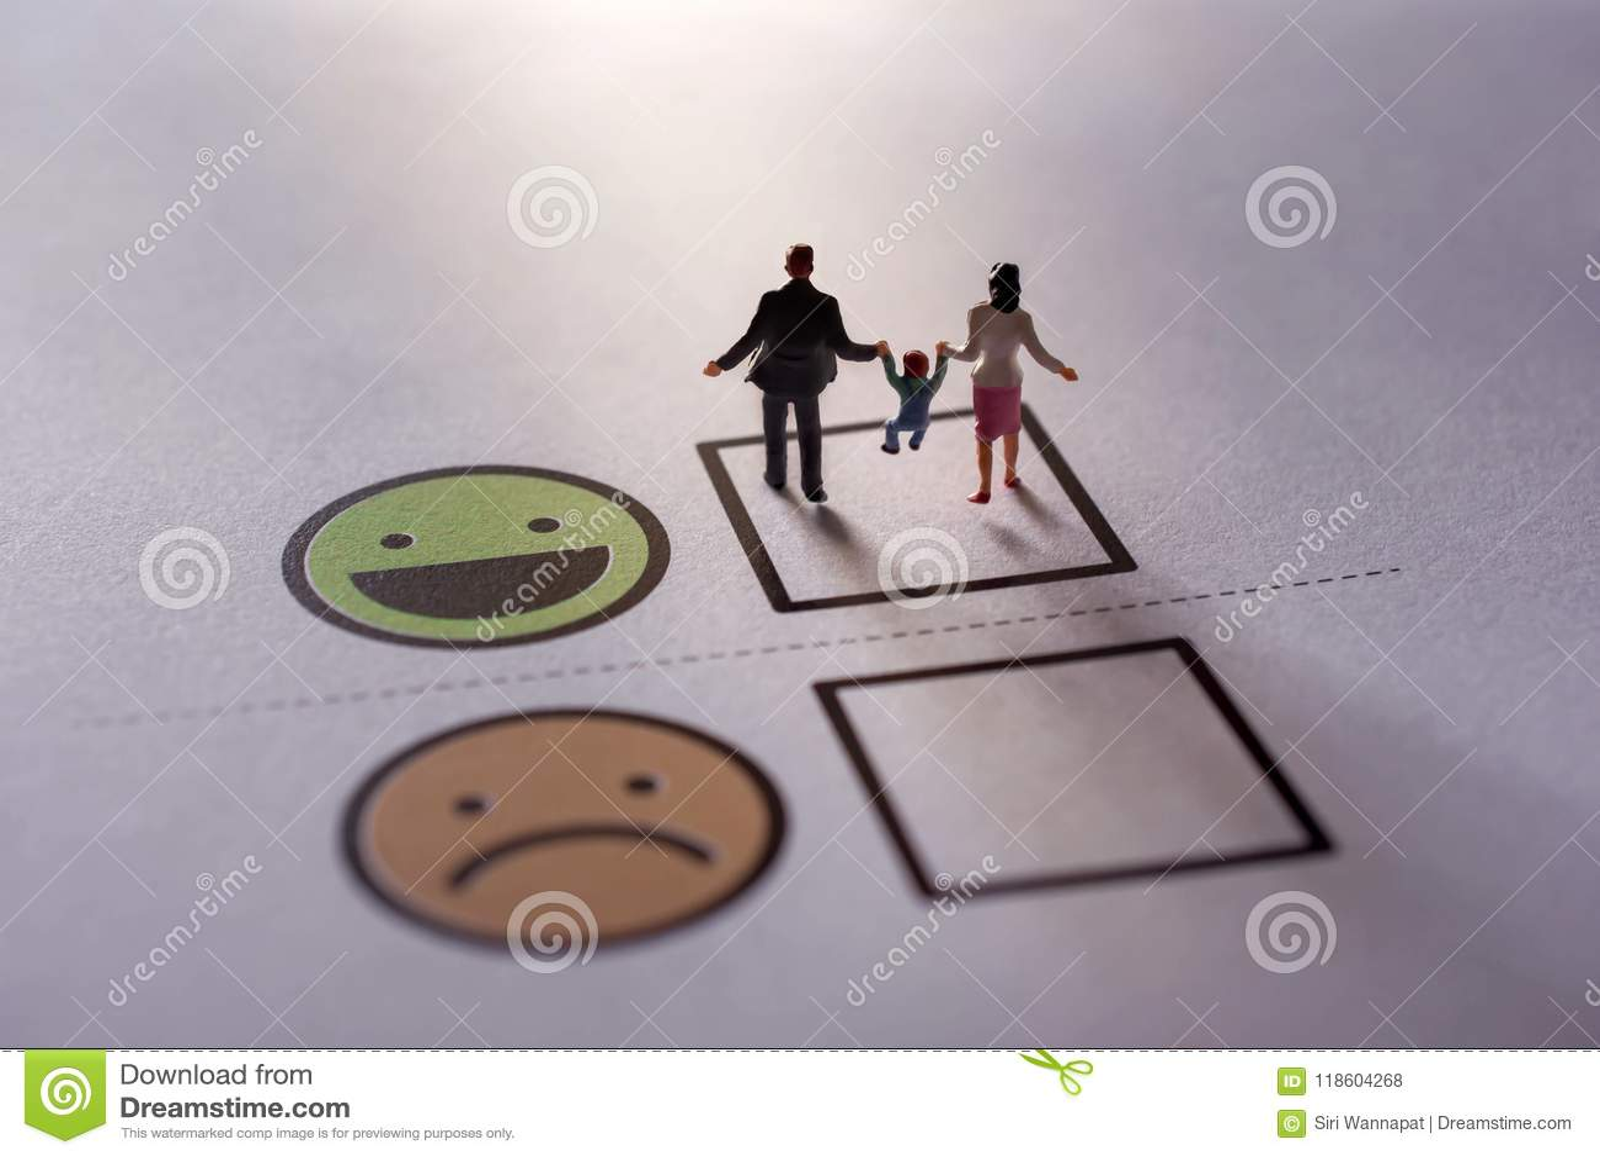 Happy Family Customer Concept. present by Miniature Figure of Fa